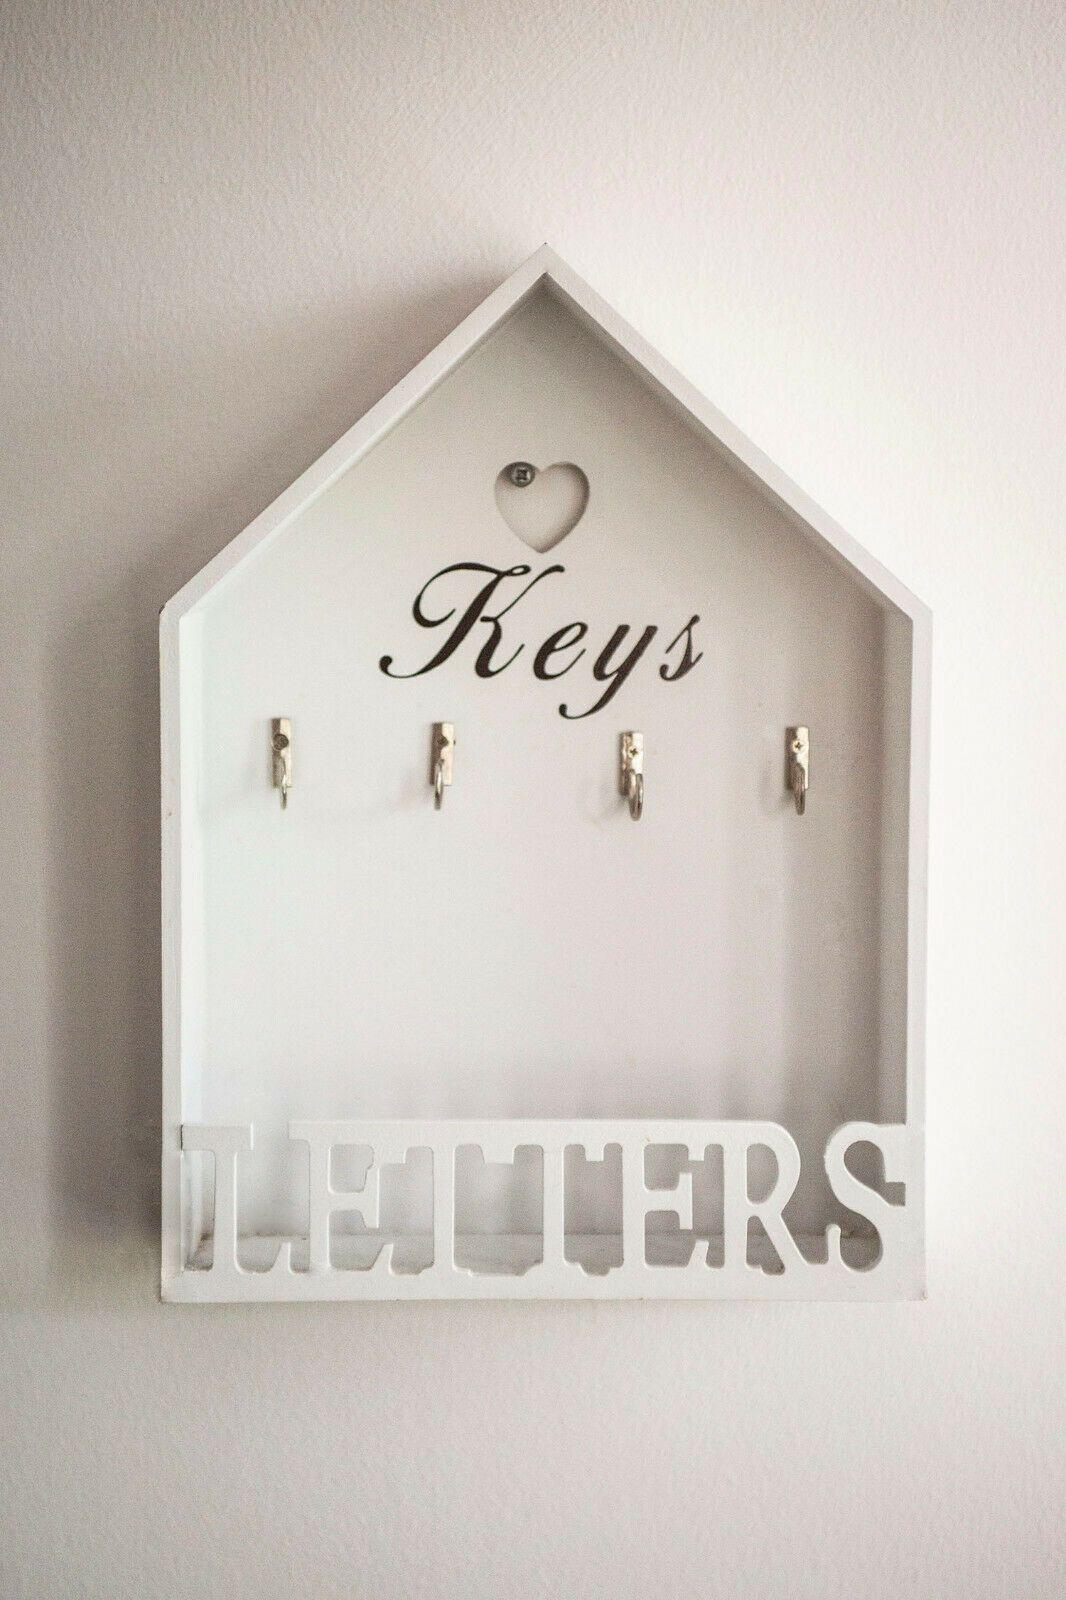 Vintage Shabby Letter Key Hooks Rack Storage Holder Chic Wall Mounted House